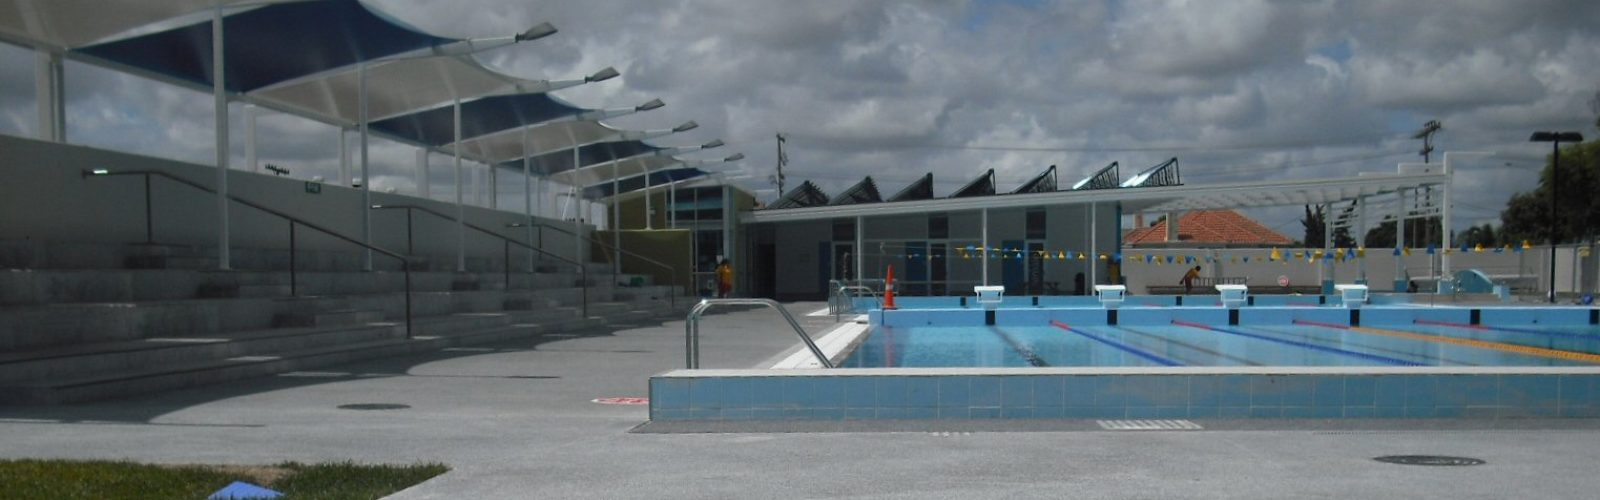 Dargaville Swimming Pool - Header Image